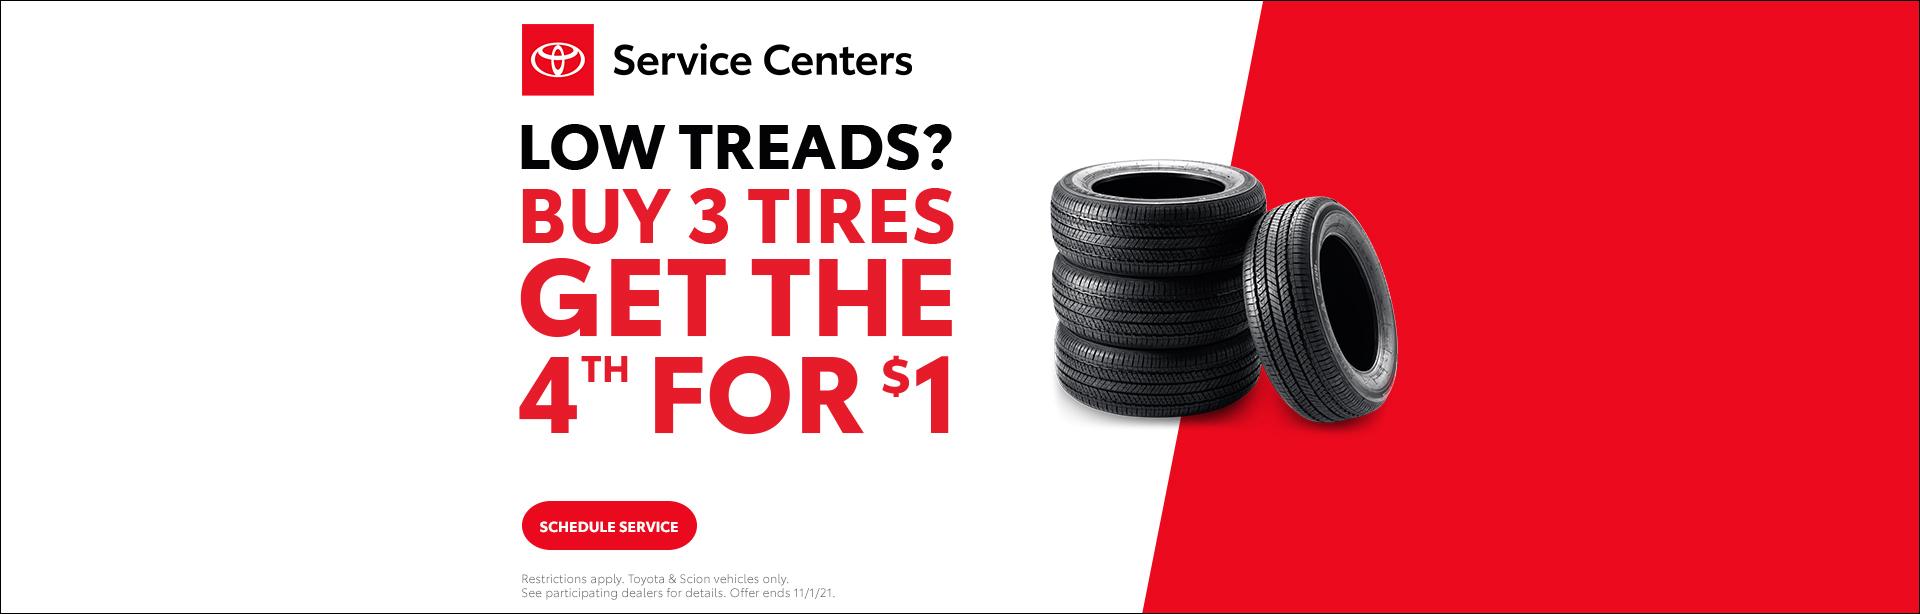 10-21_01_SF-September-2021-NAT-Buy-3-Tires---SF_1920x614_4777_All-Models_R_xta.jpeg